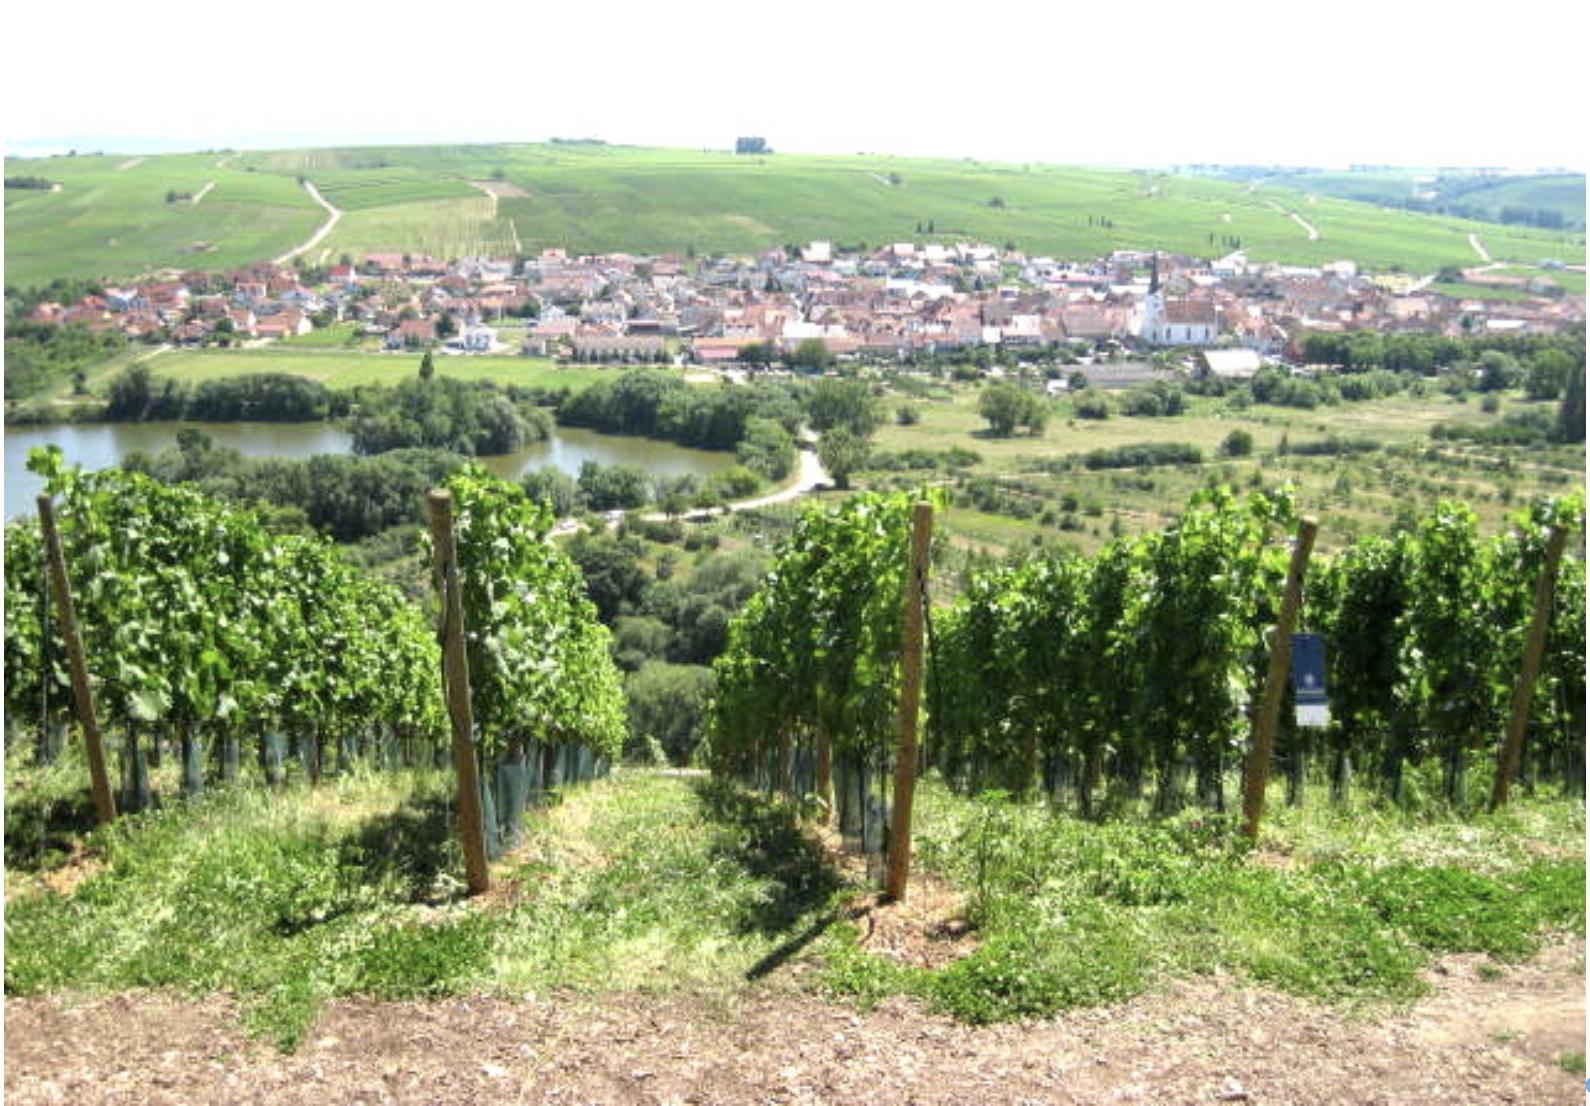 Central Germany, Obereisenheim, Nuernberg, Franconian countryside, Franks, Roman Empire, wine, vineyards